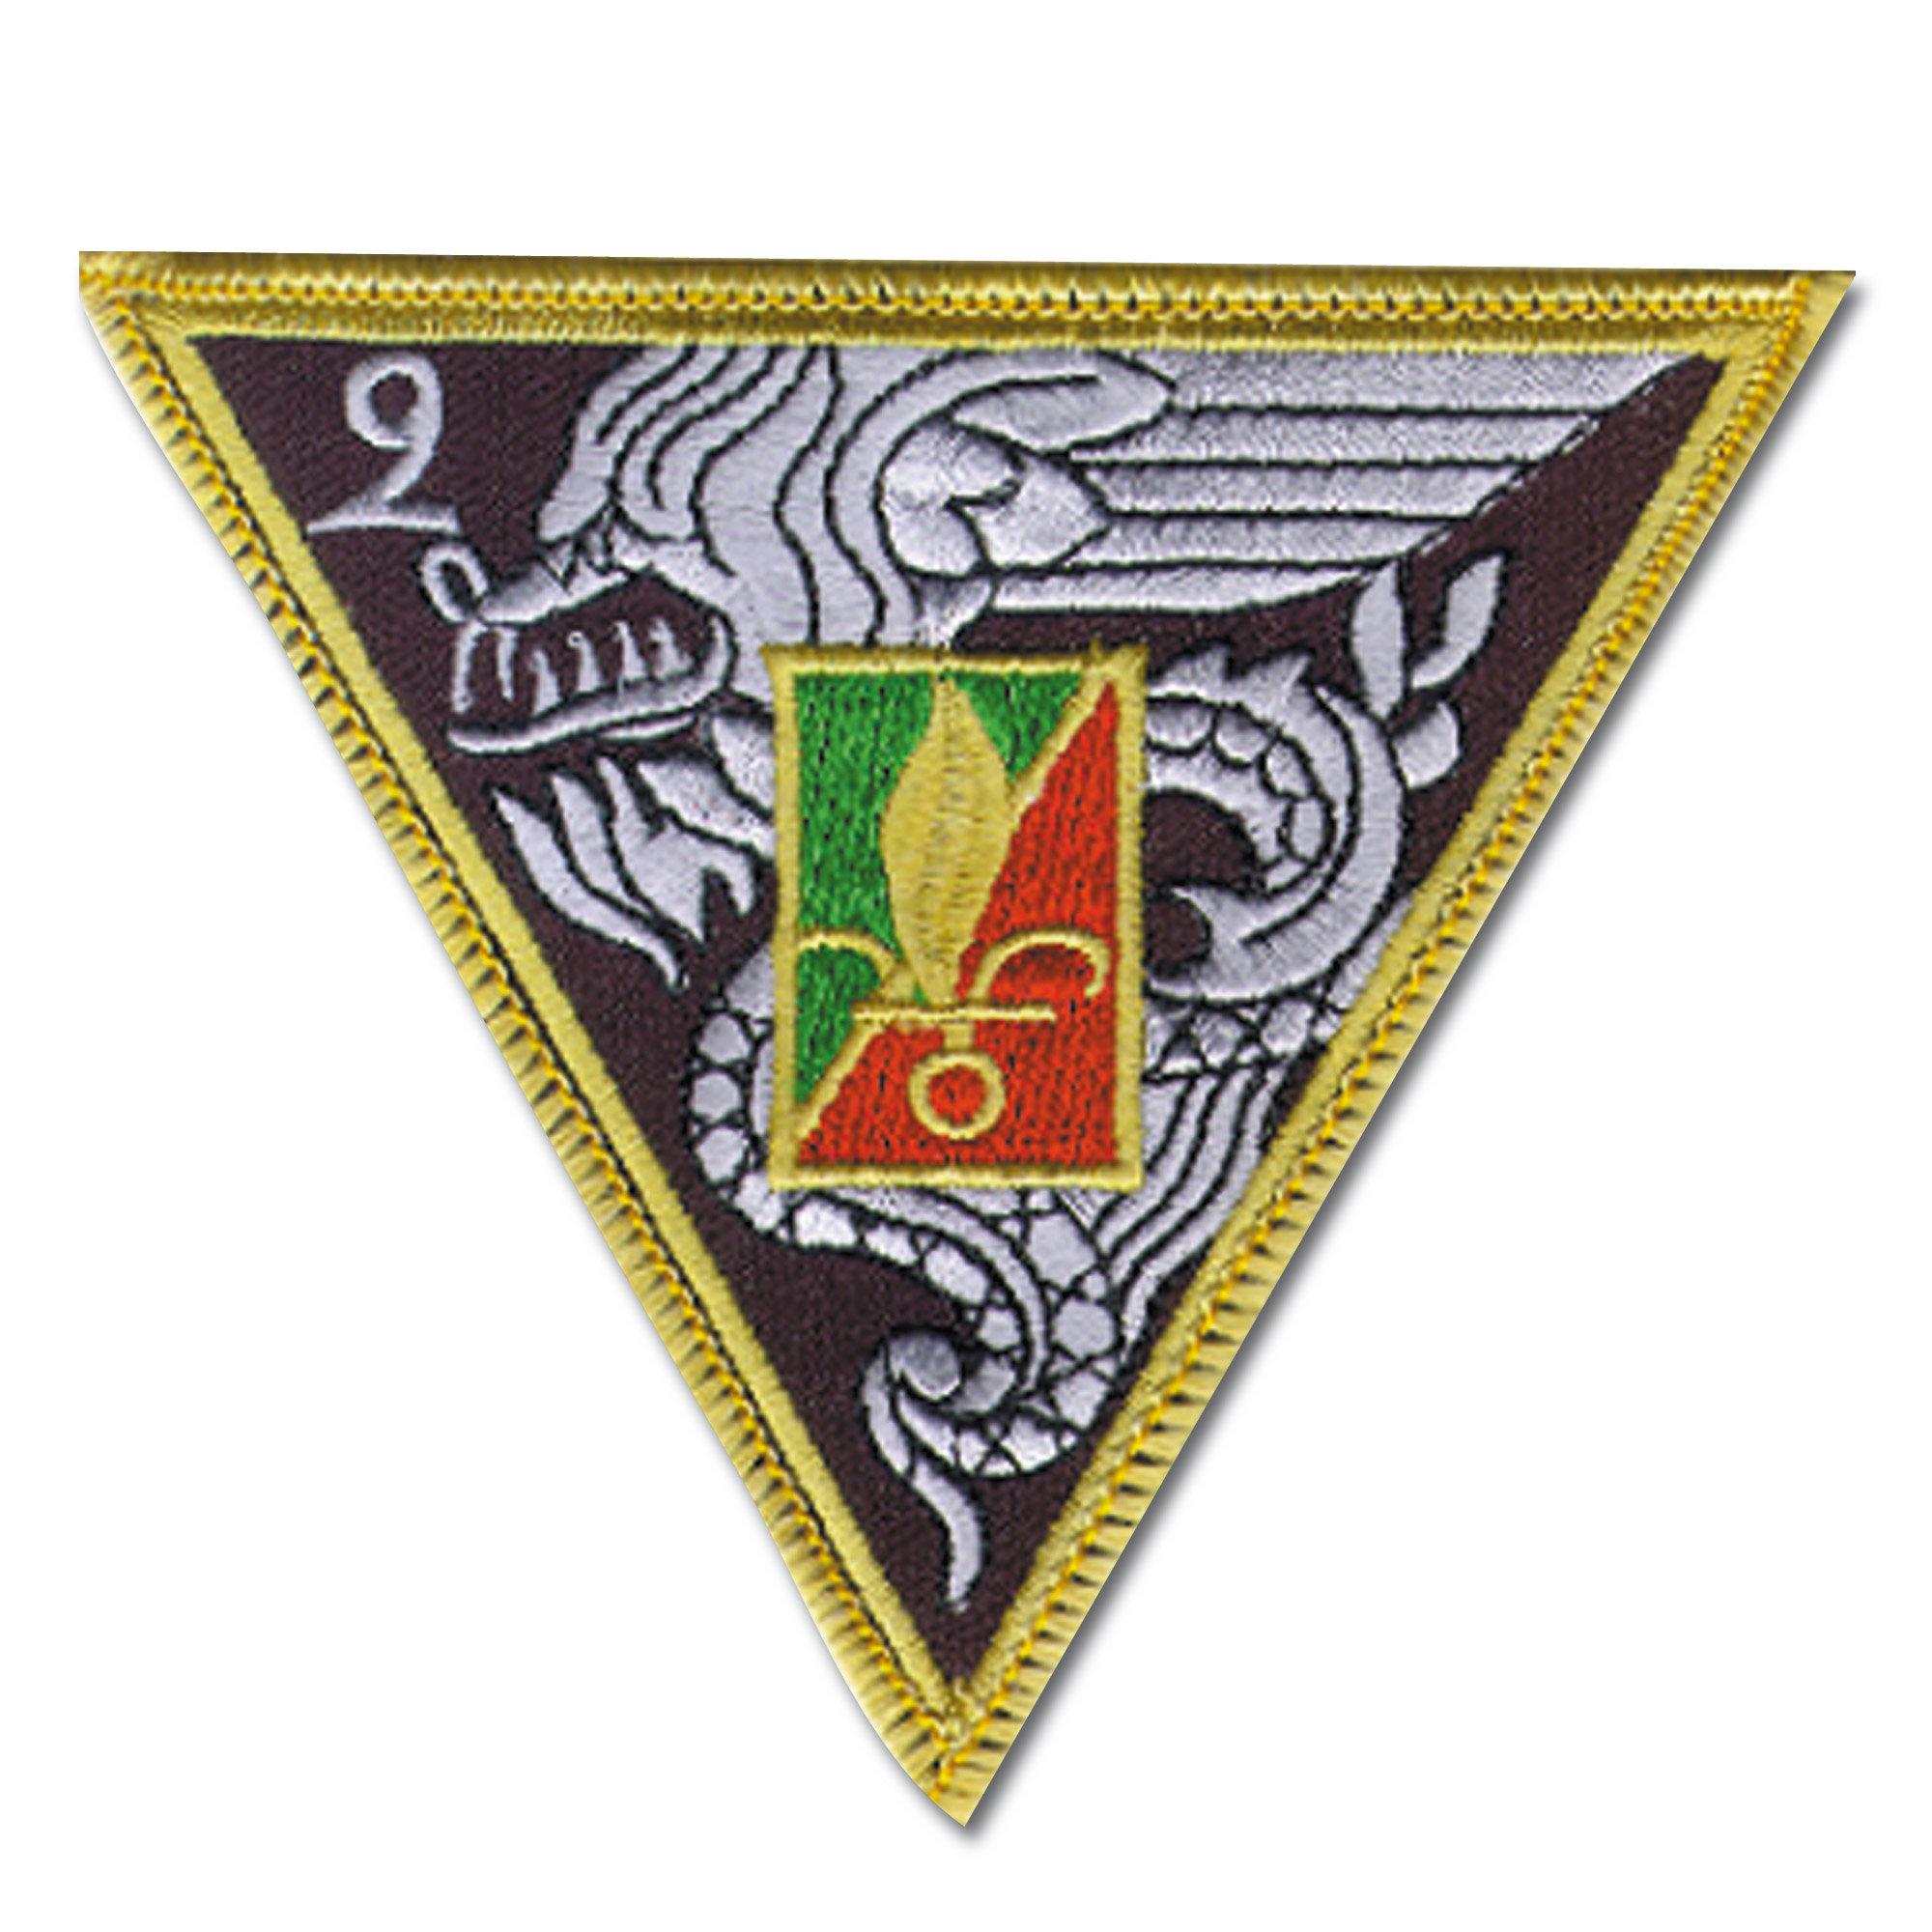 French Insignia 2ème REP Textile